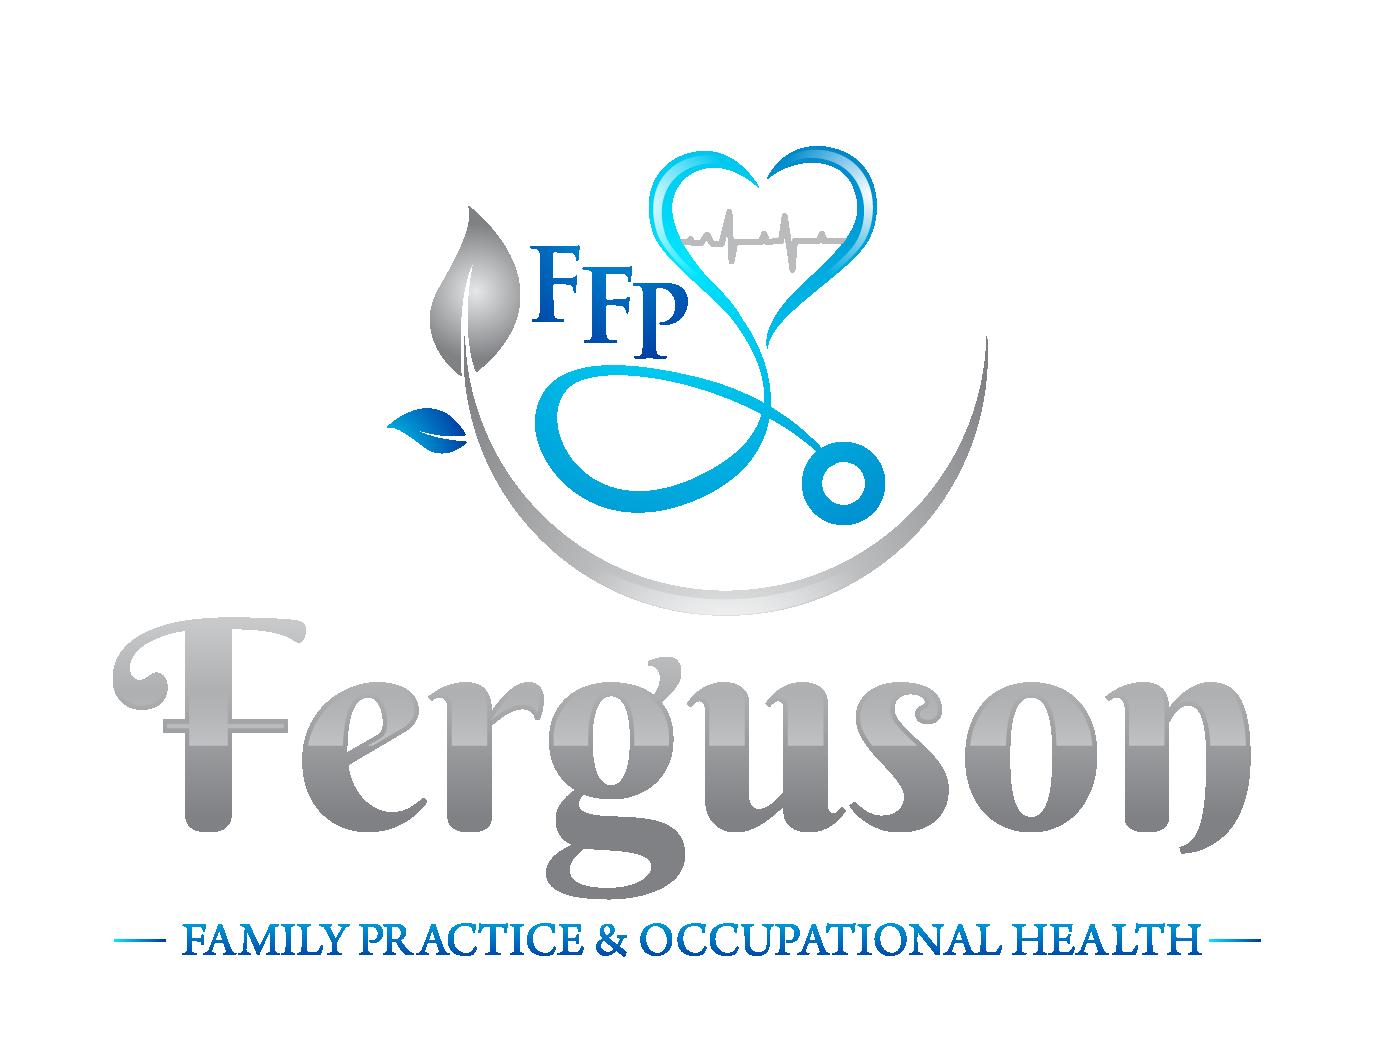 Ferguson Family Practice